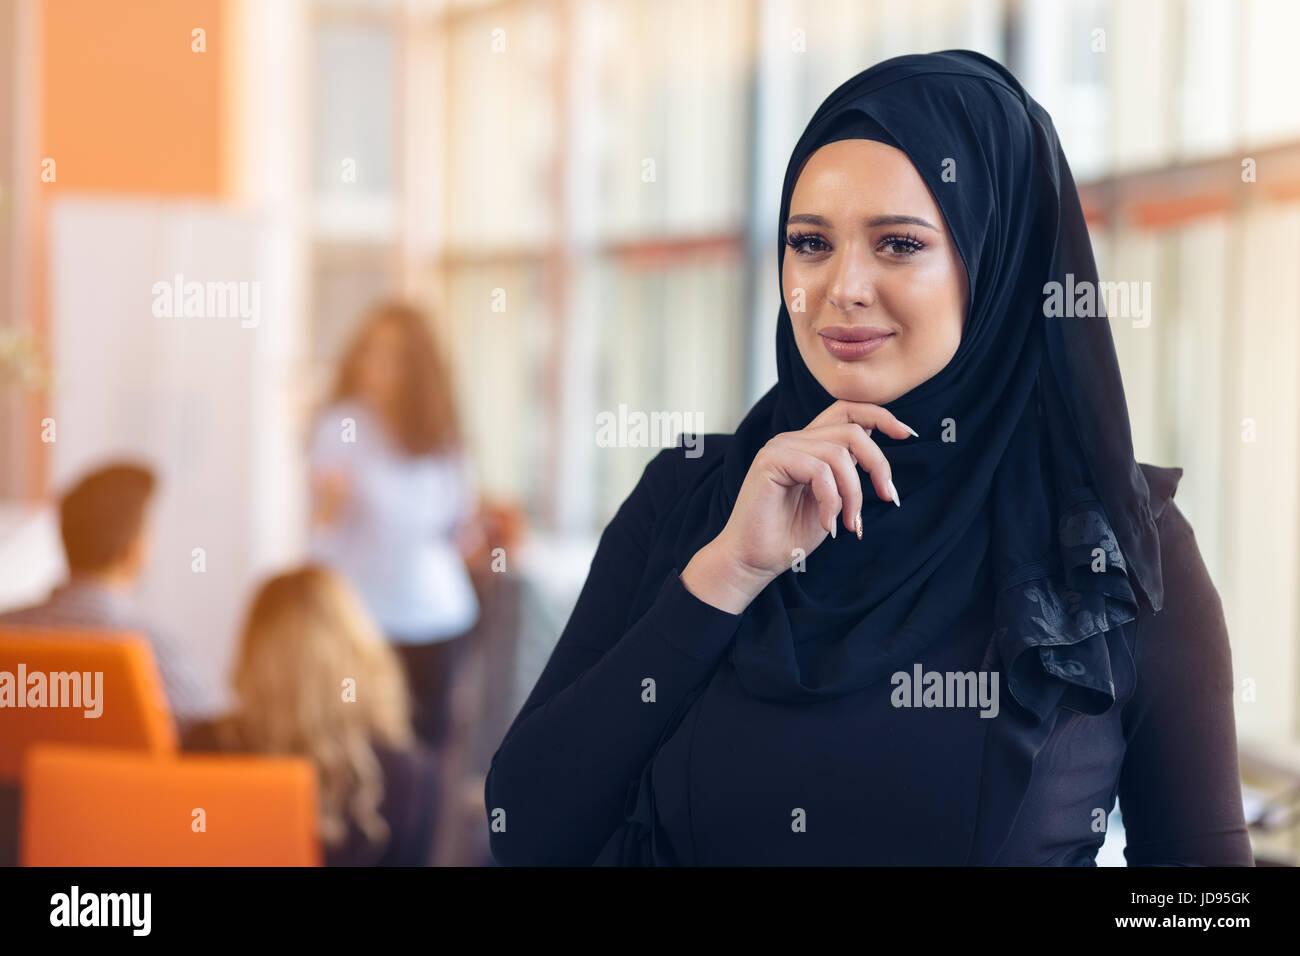 Joli portrait de jeune femme musulmane avec hijab noir au bureau